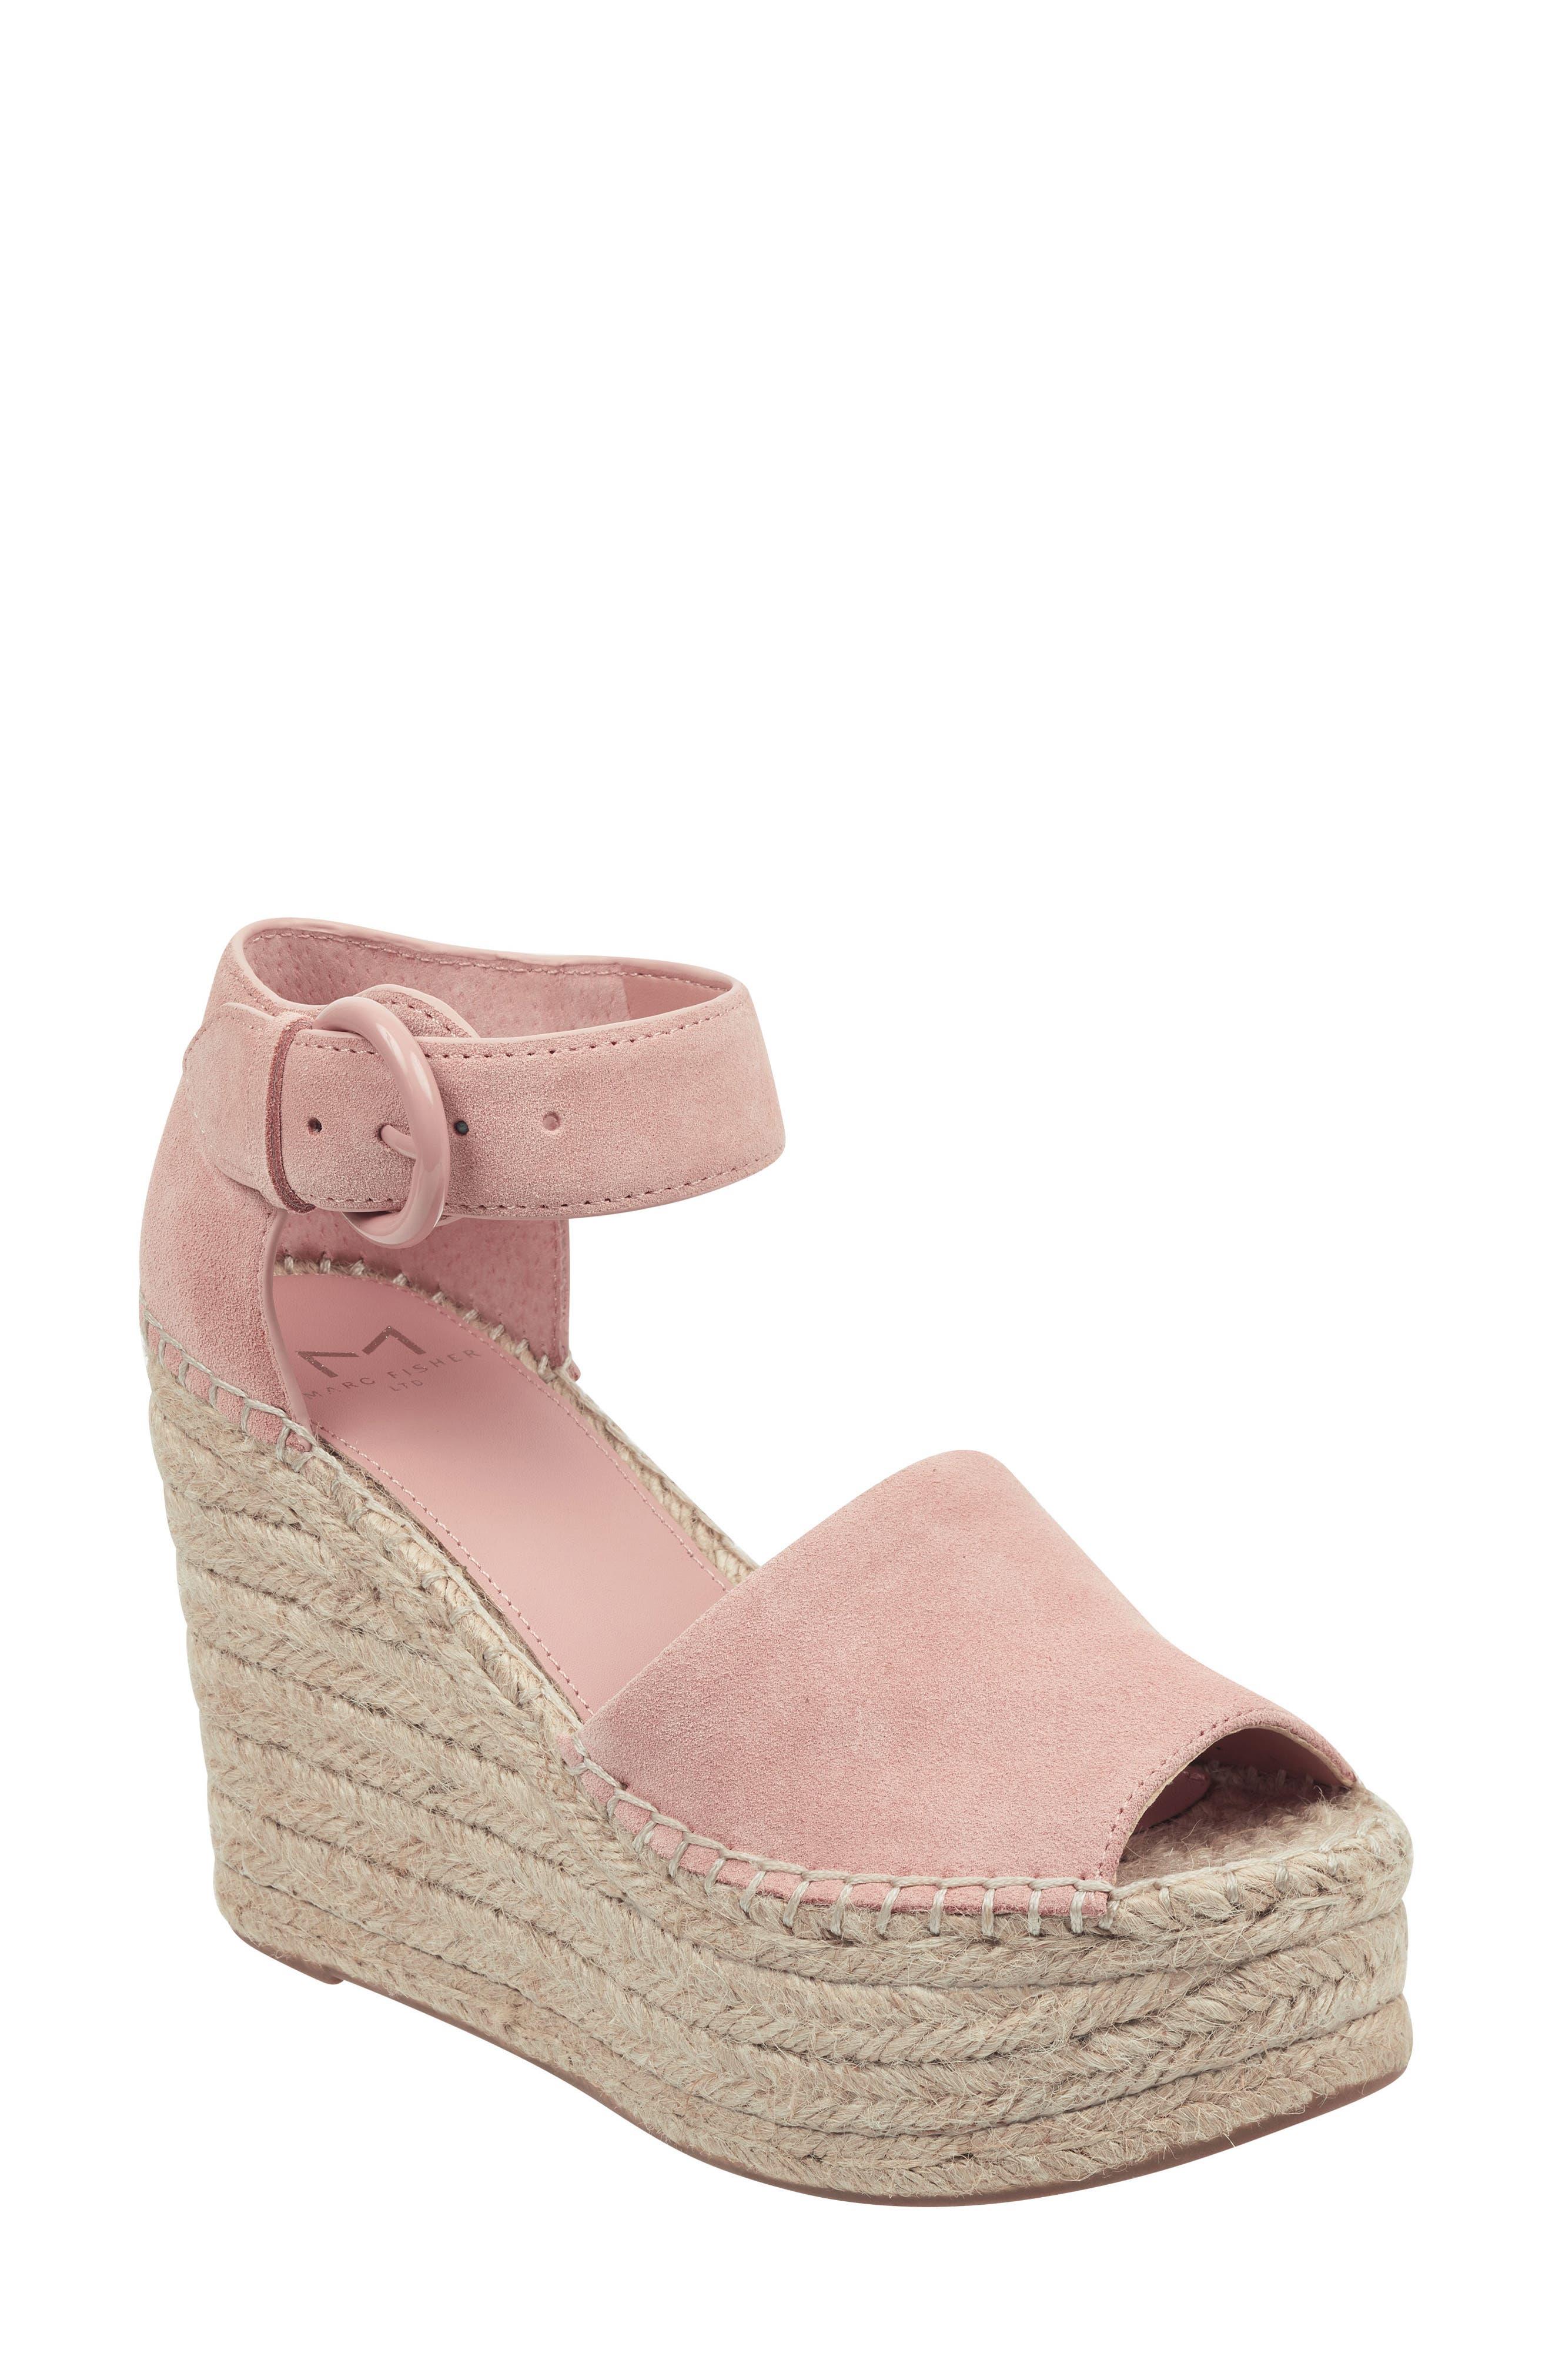 Marc Fisher Ltd Alida Espadrille Platform Wedge, Pink